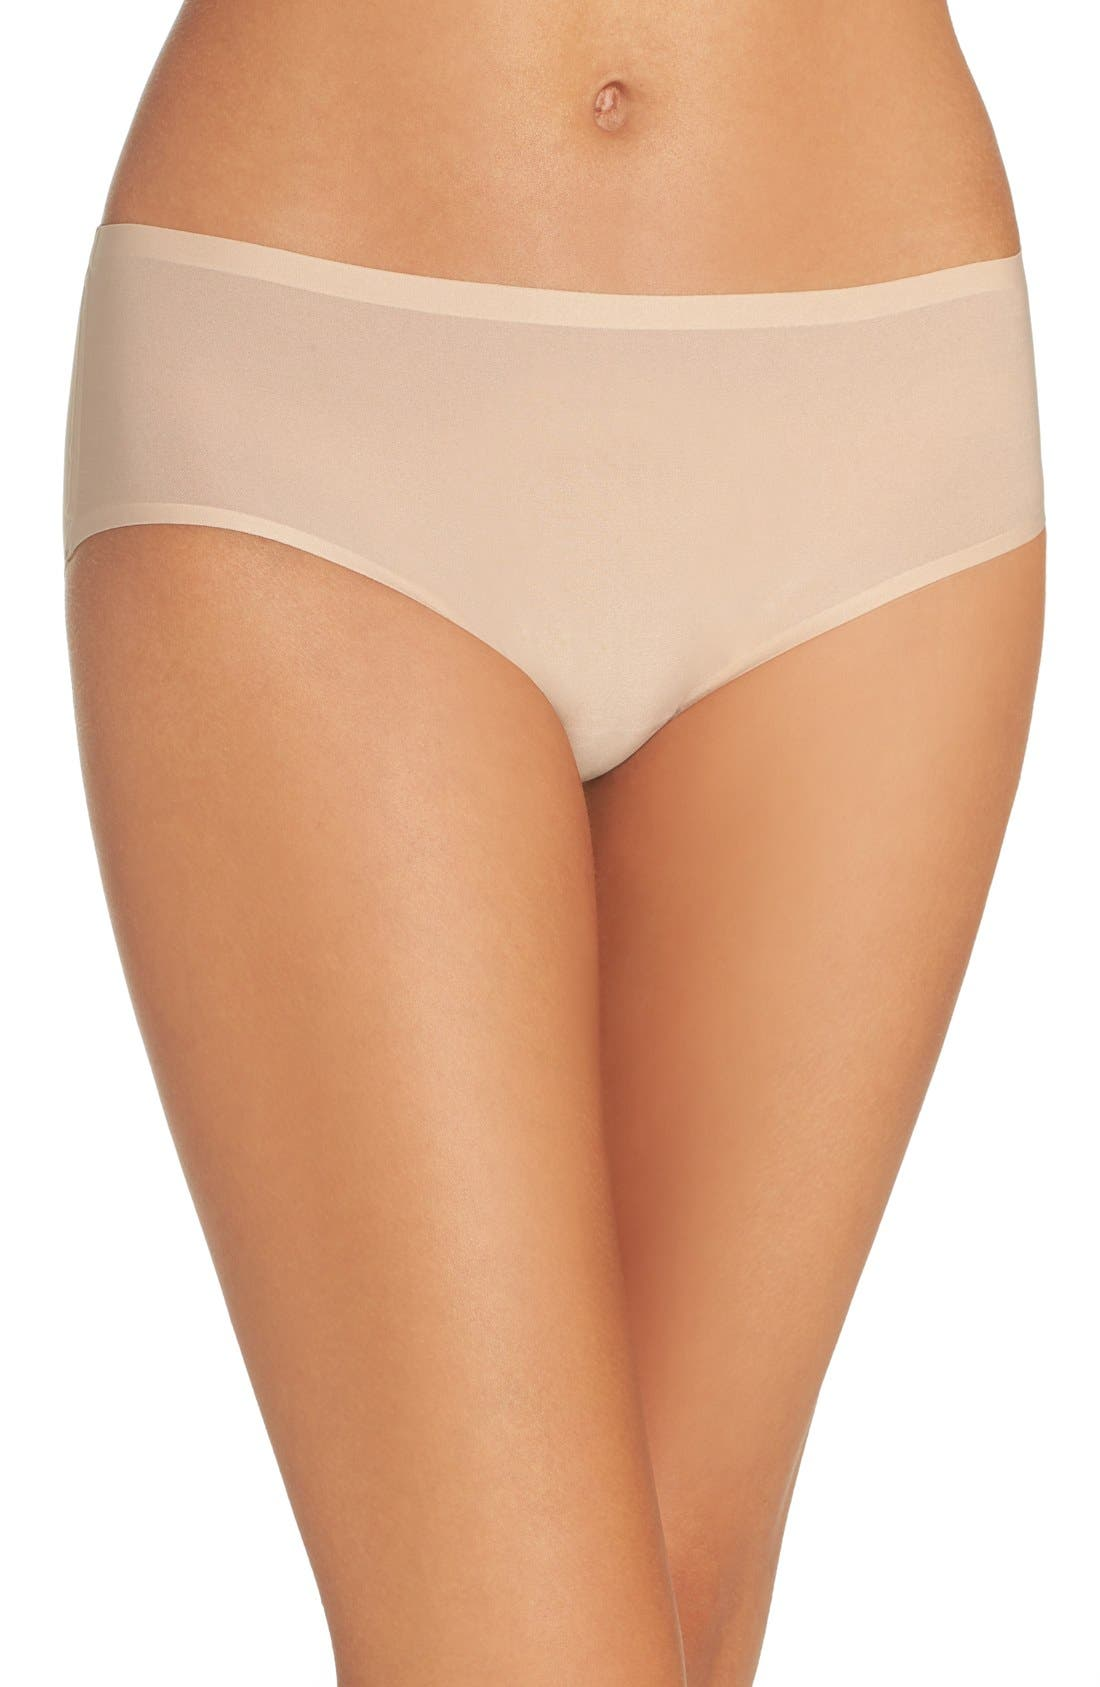 Women's Chantelle Lingerie Soft Stretch Seamless Hipster Panties